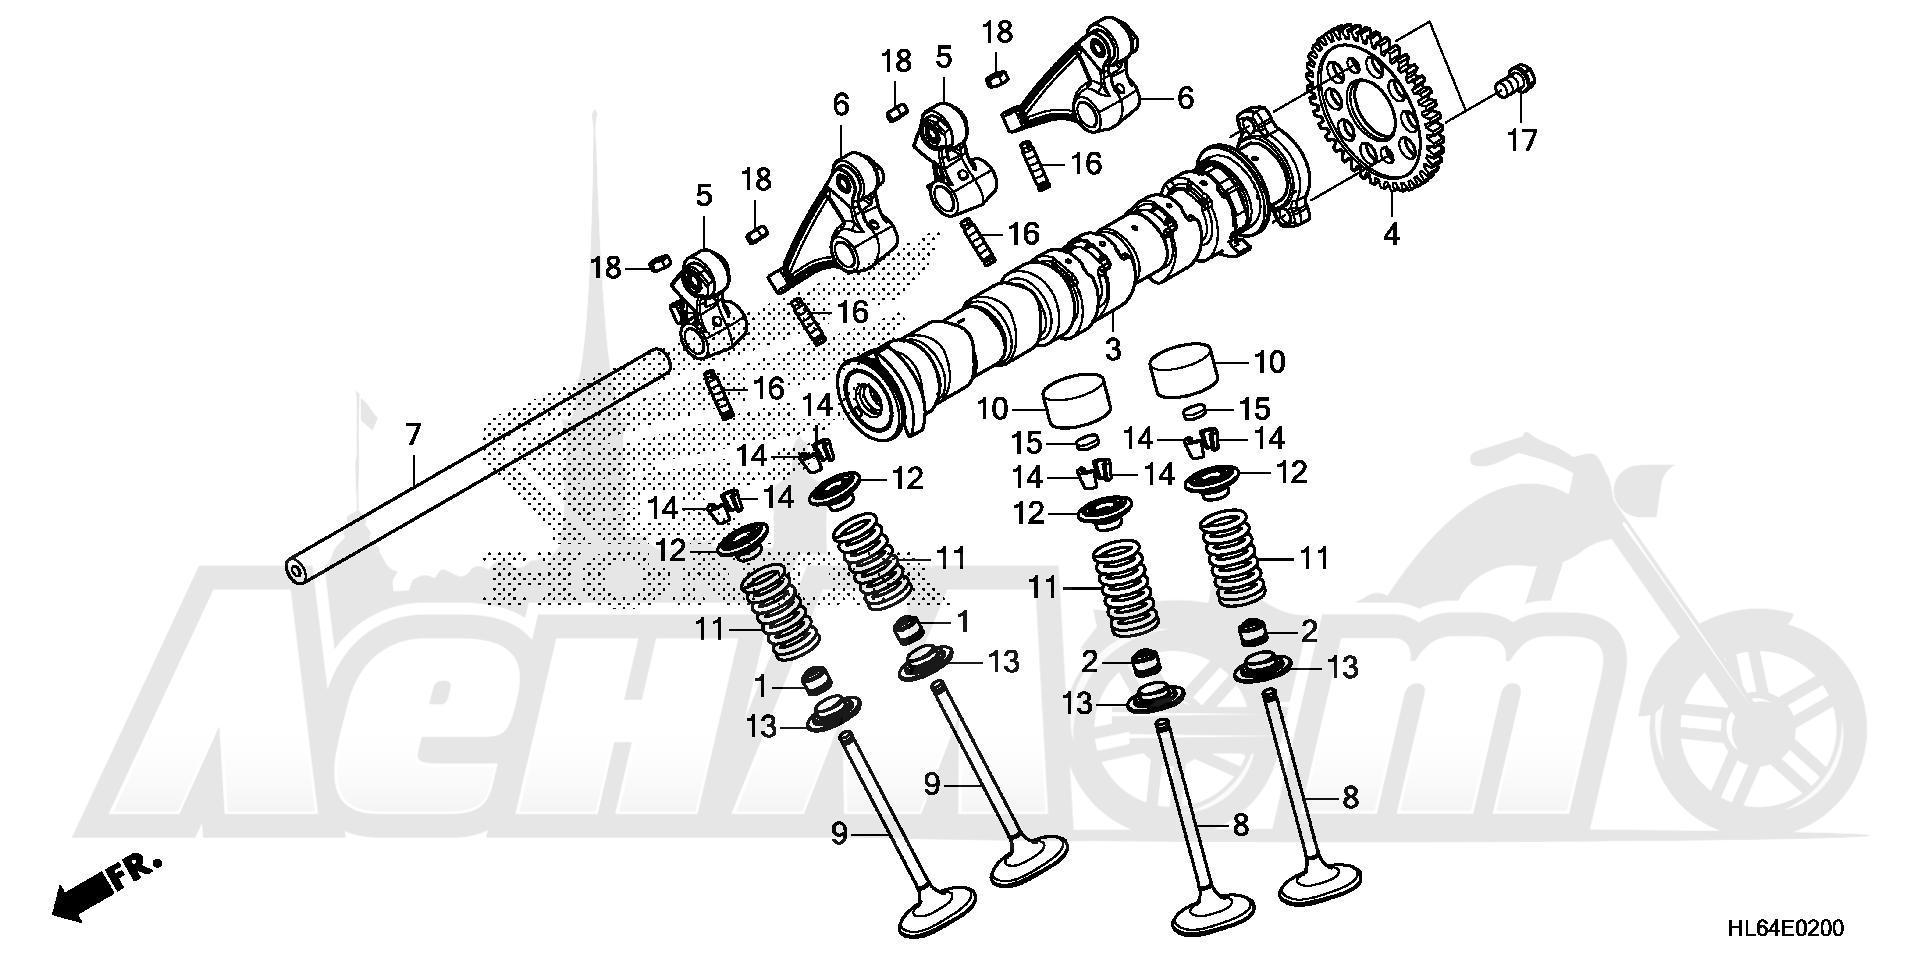 Запчасти для Квадроцикла Honda 2019 SXS1000S2R Раздел: CAMSHAFT AND VALVE | распредвал и клапан